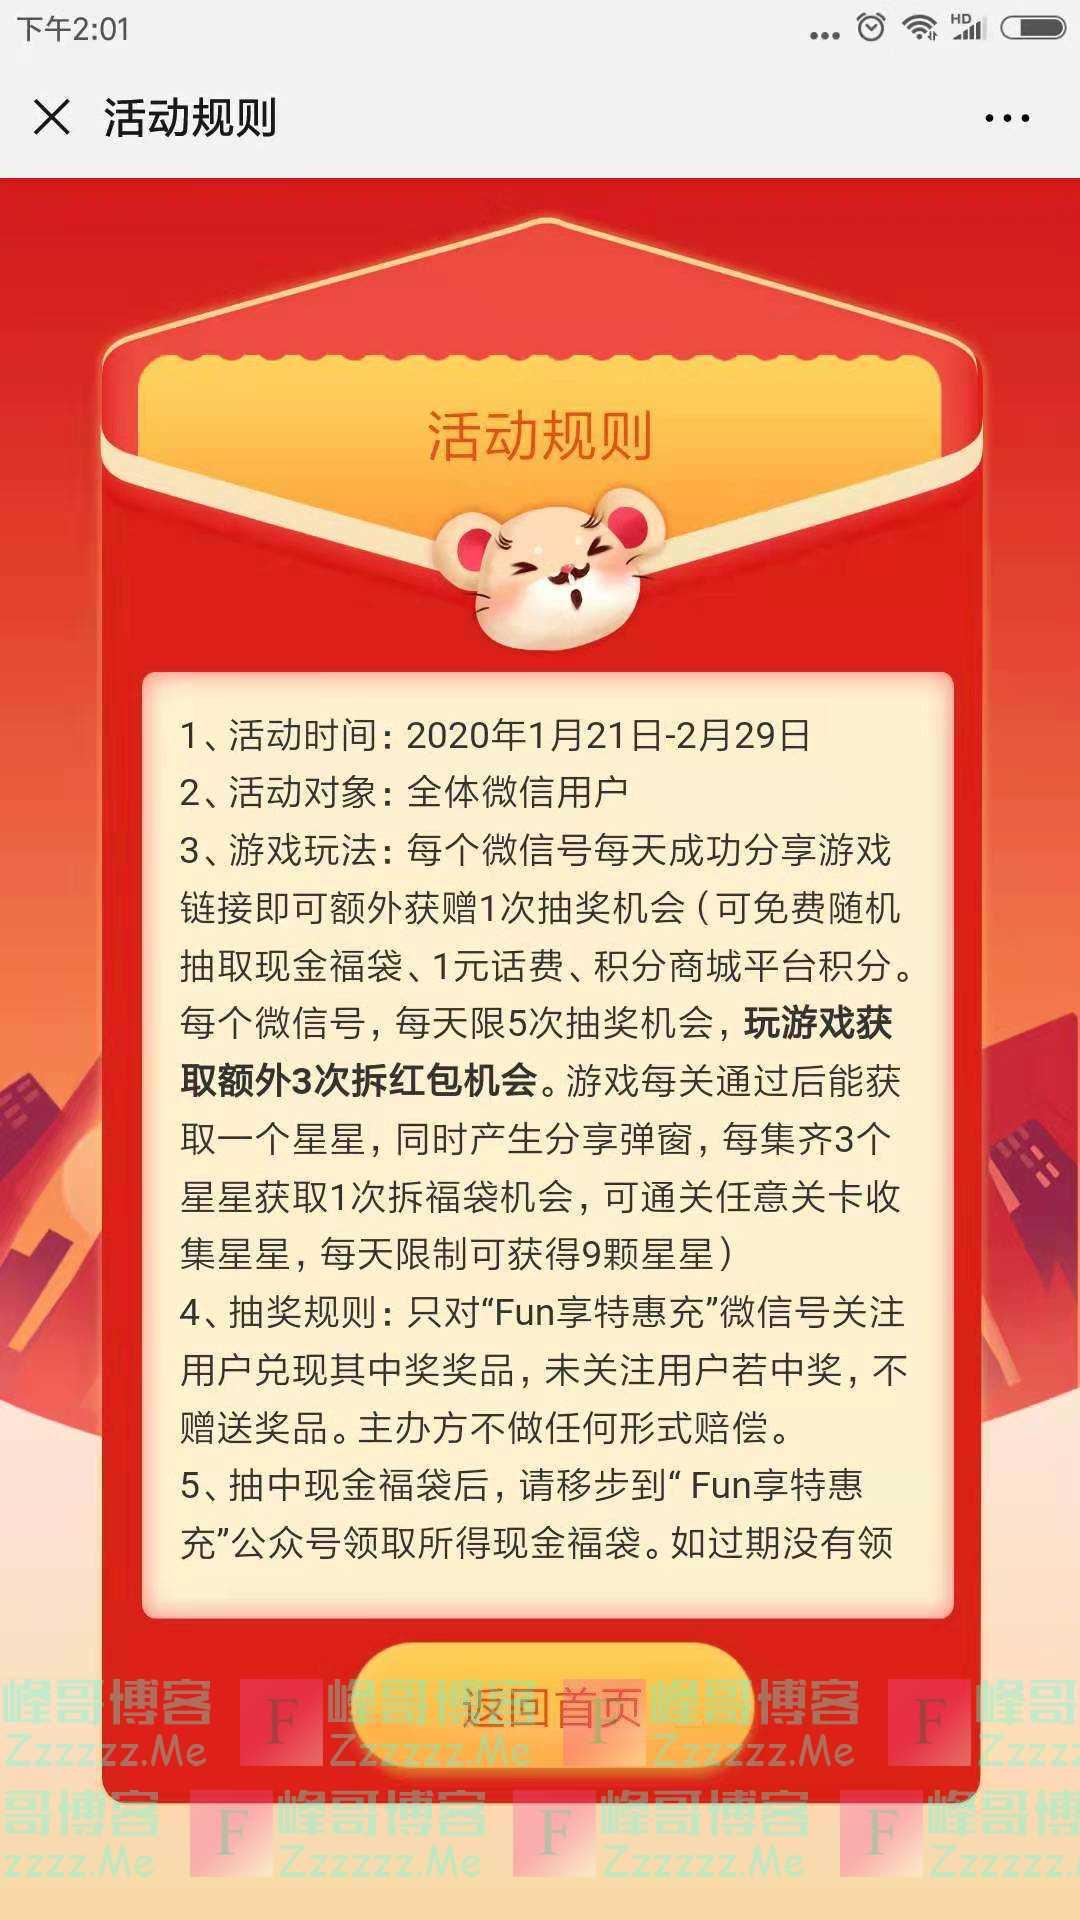 Fun享充元宵福利 新增千份现金红包(截止2月29日)